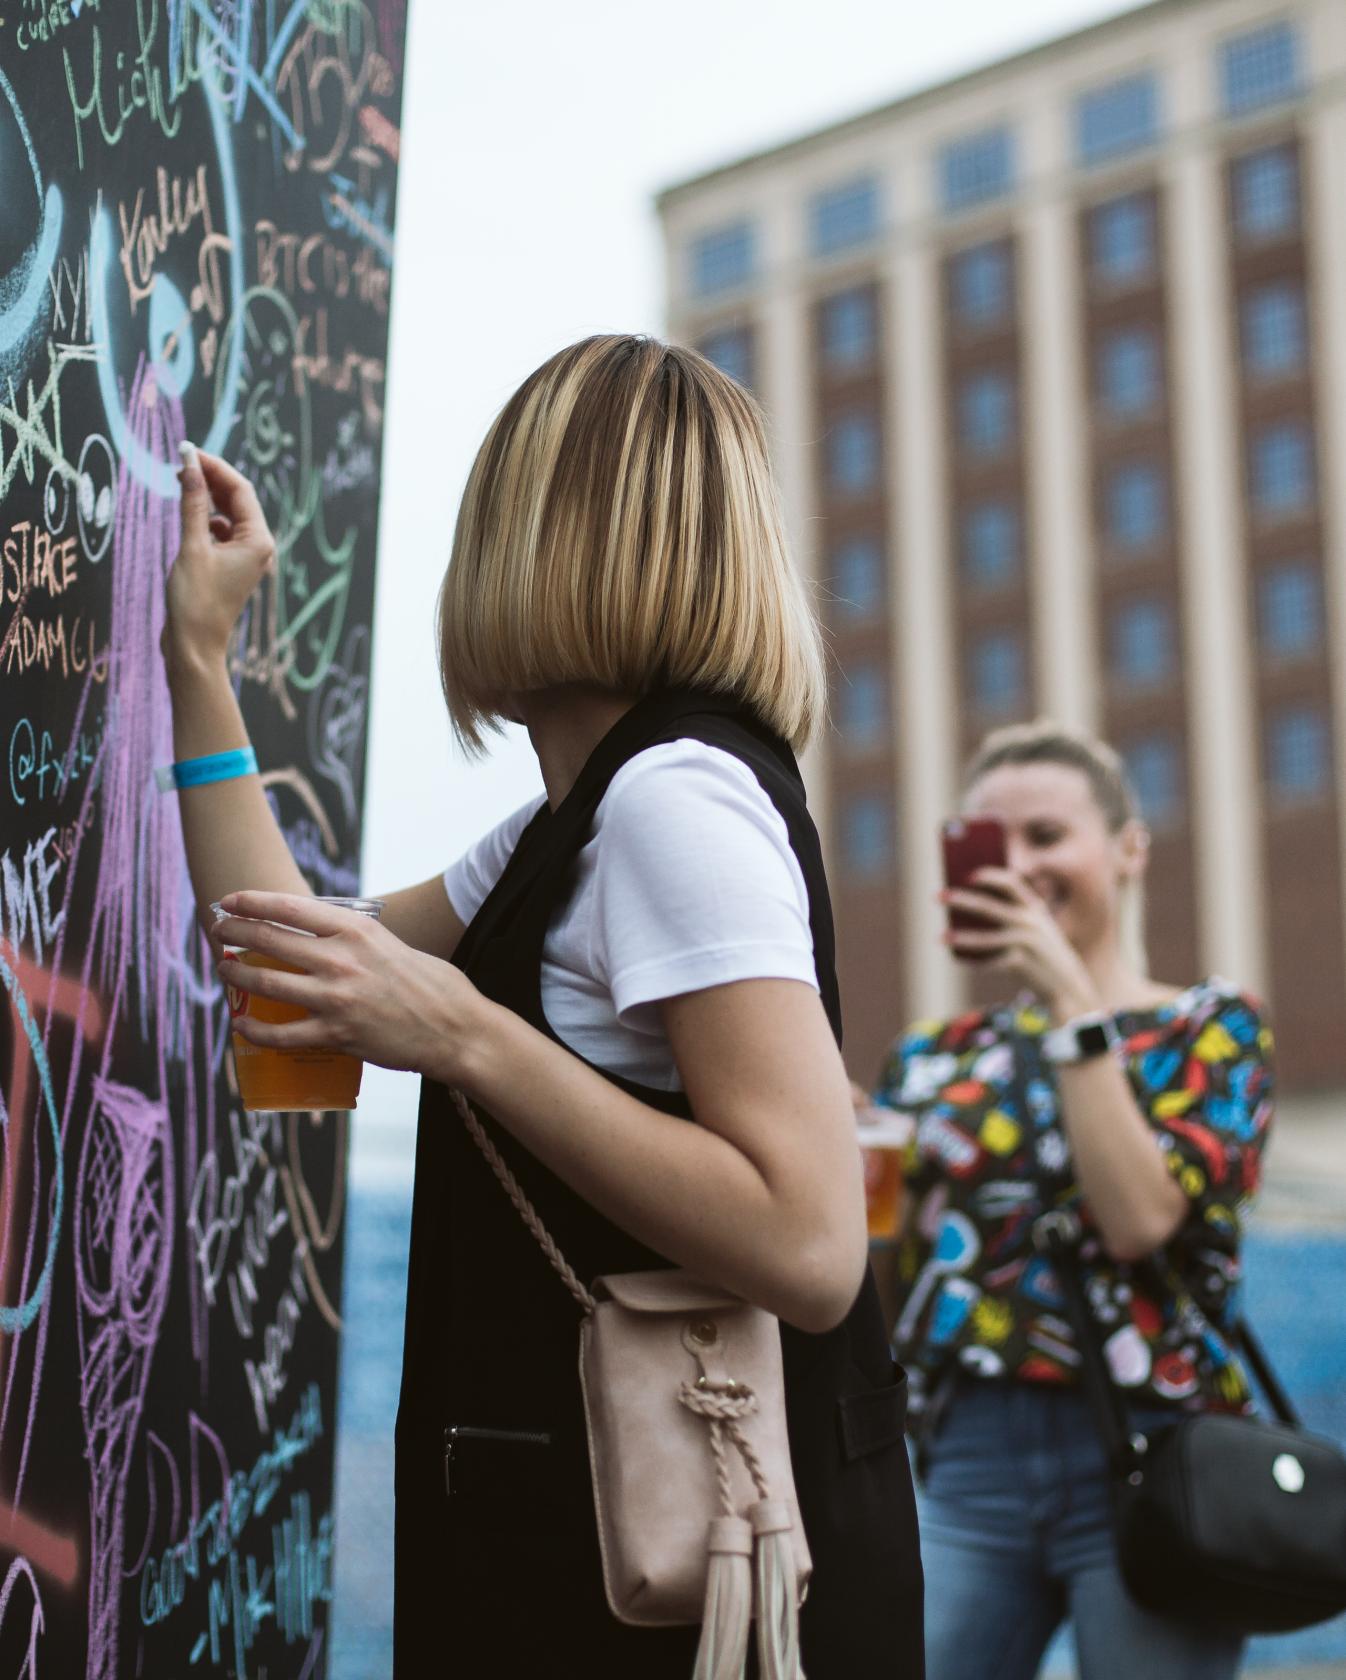 Woman drinking beer while drawing graffiti